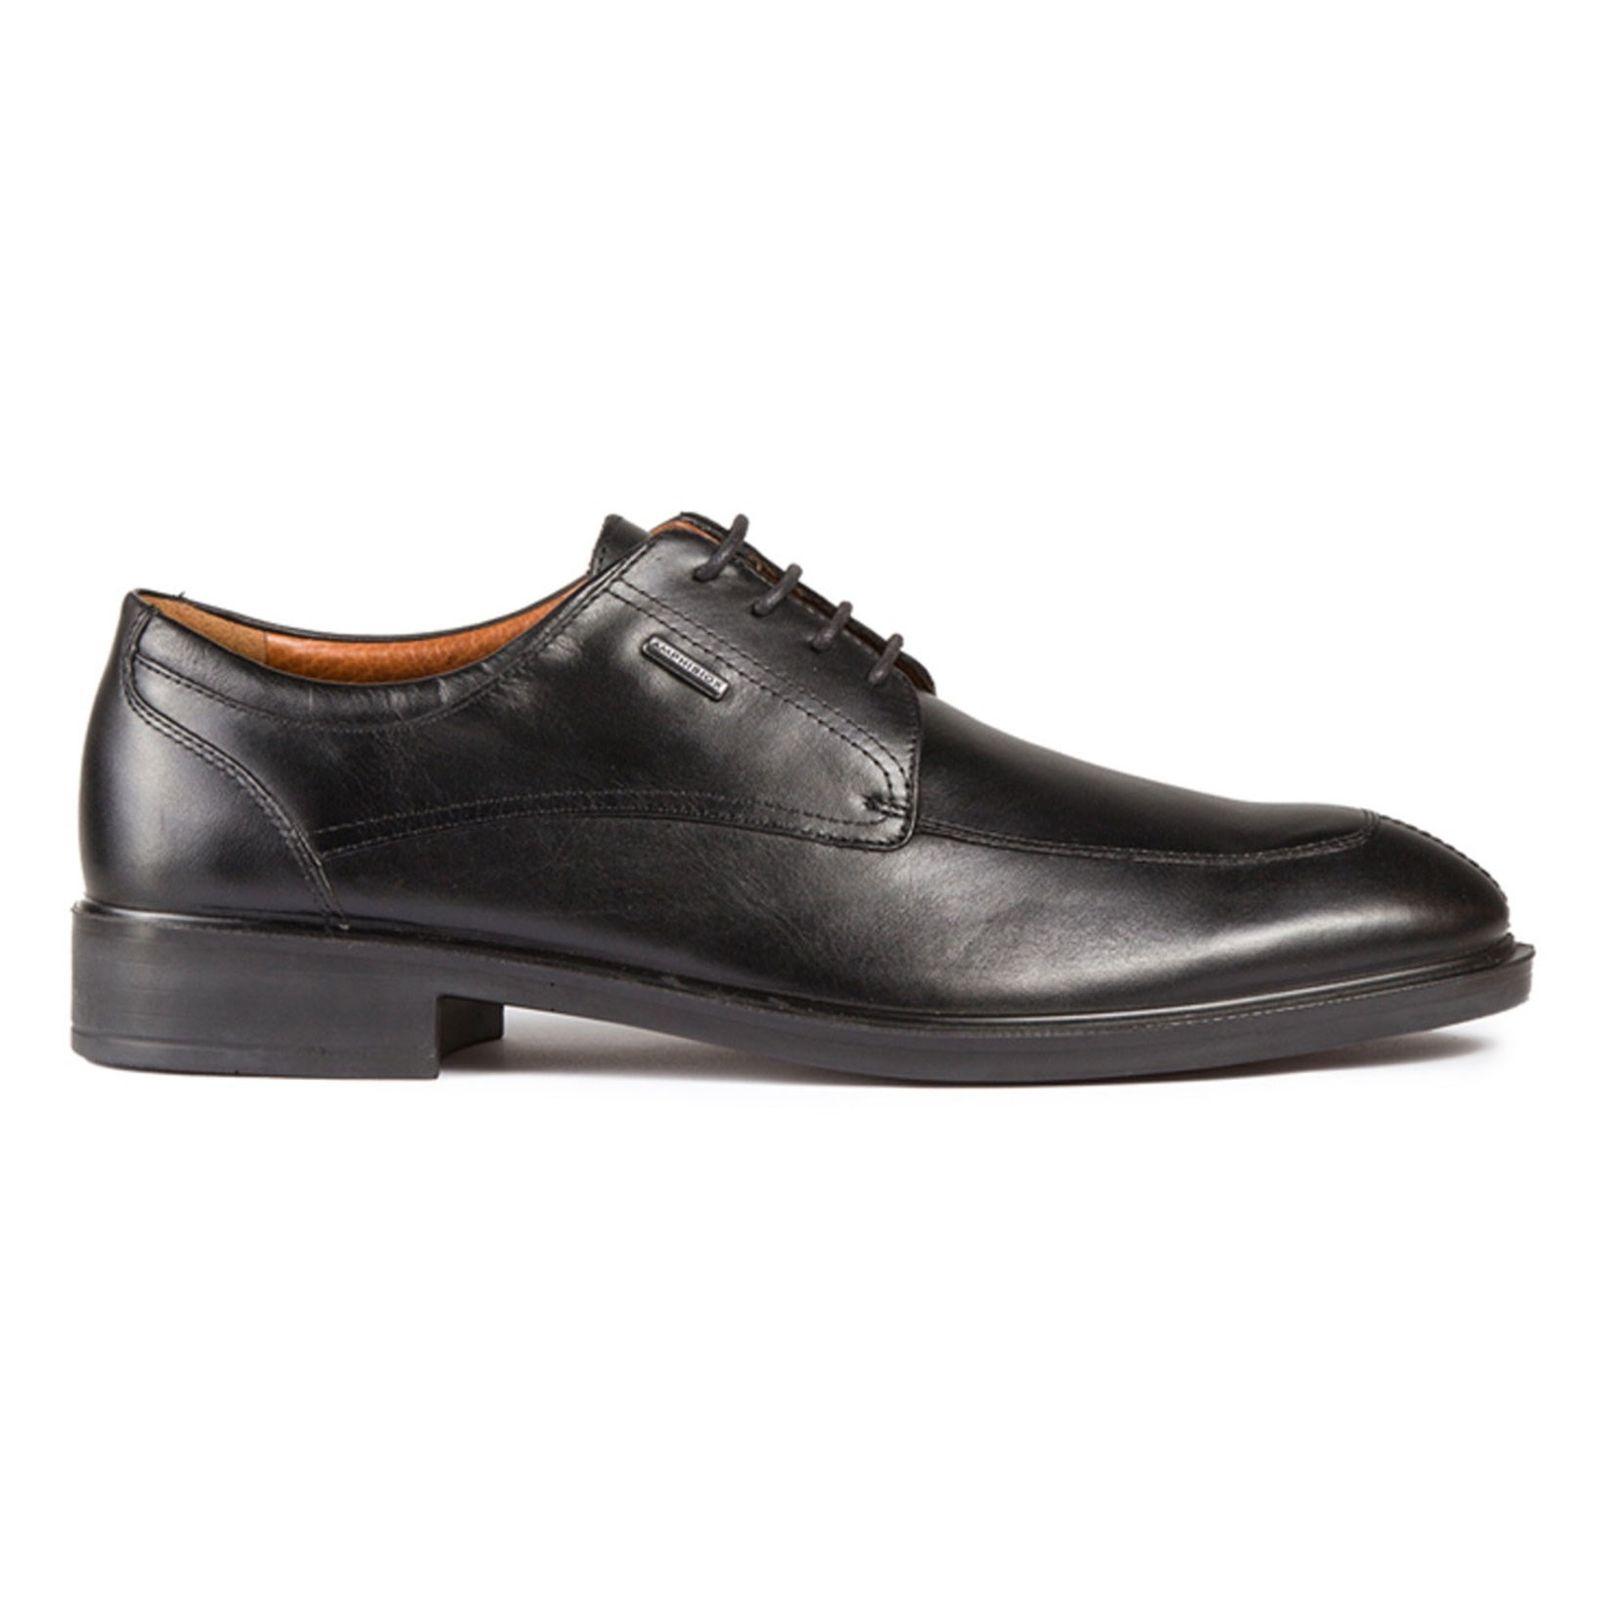 کفش رسمی چرم مردانه - جی اوکس - مشکي - 1